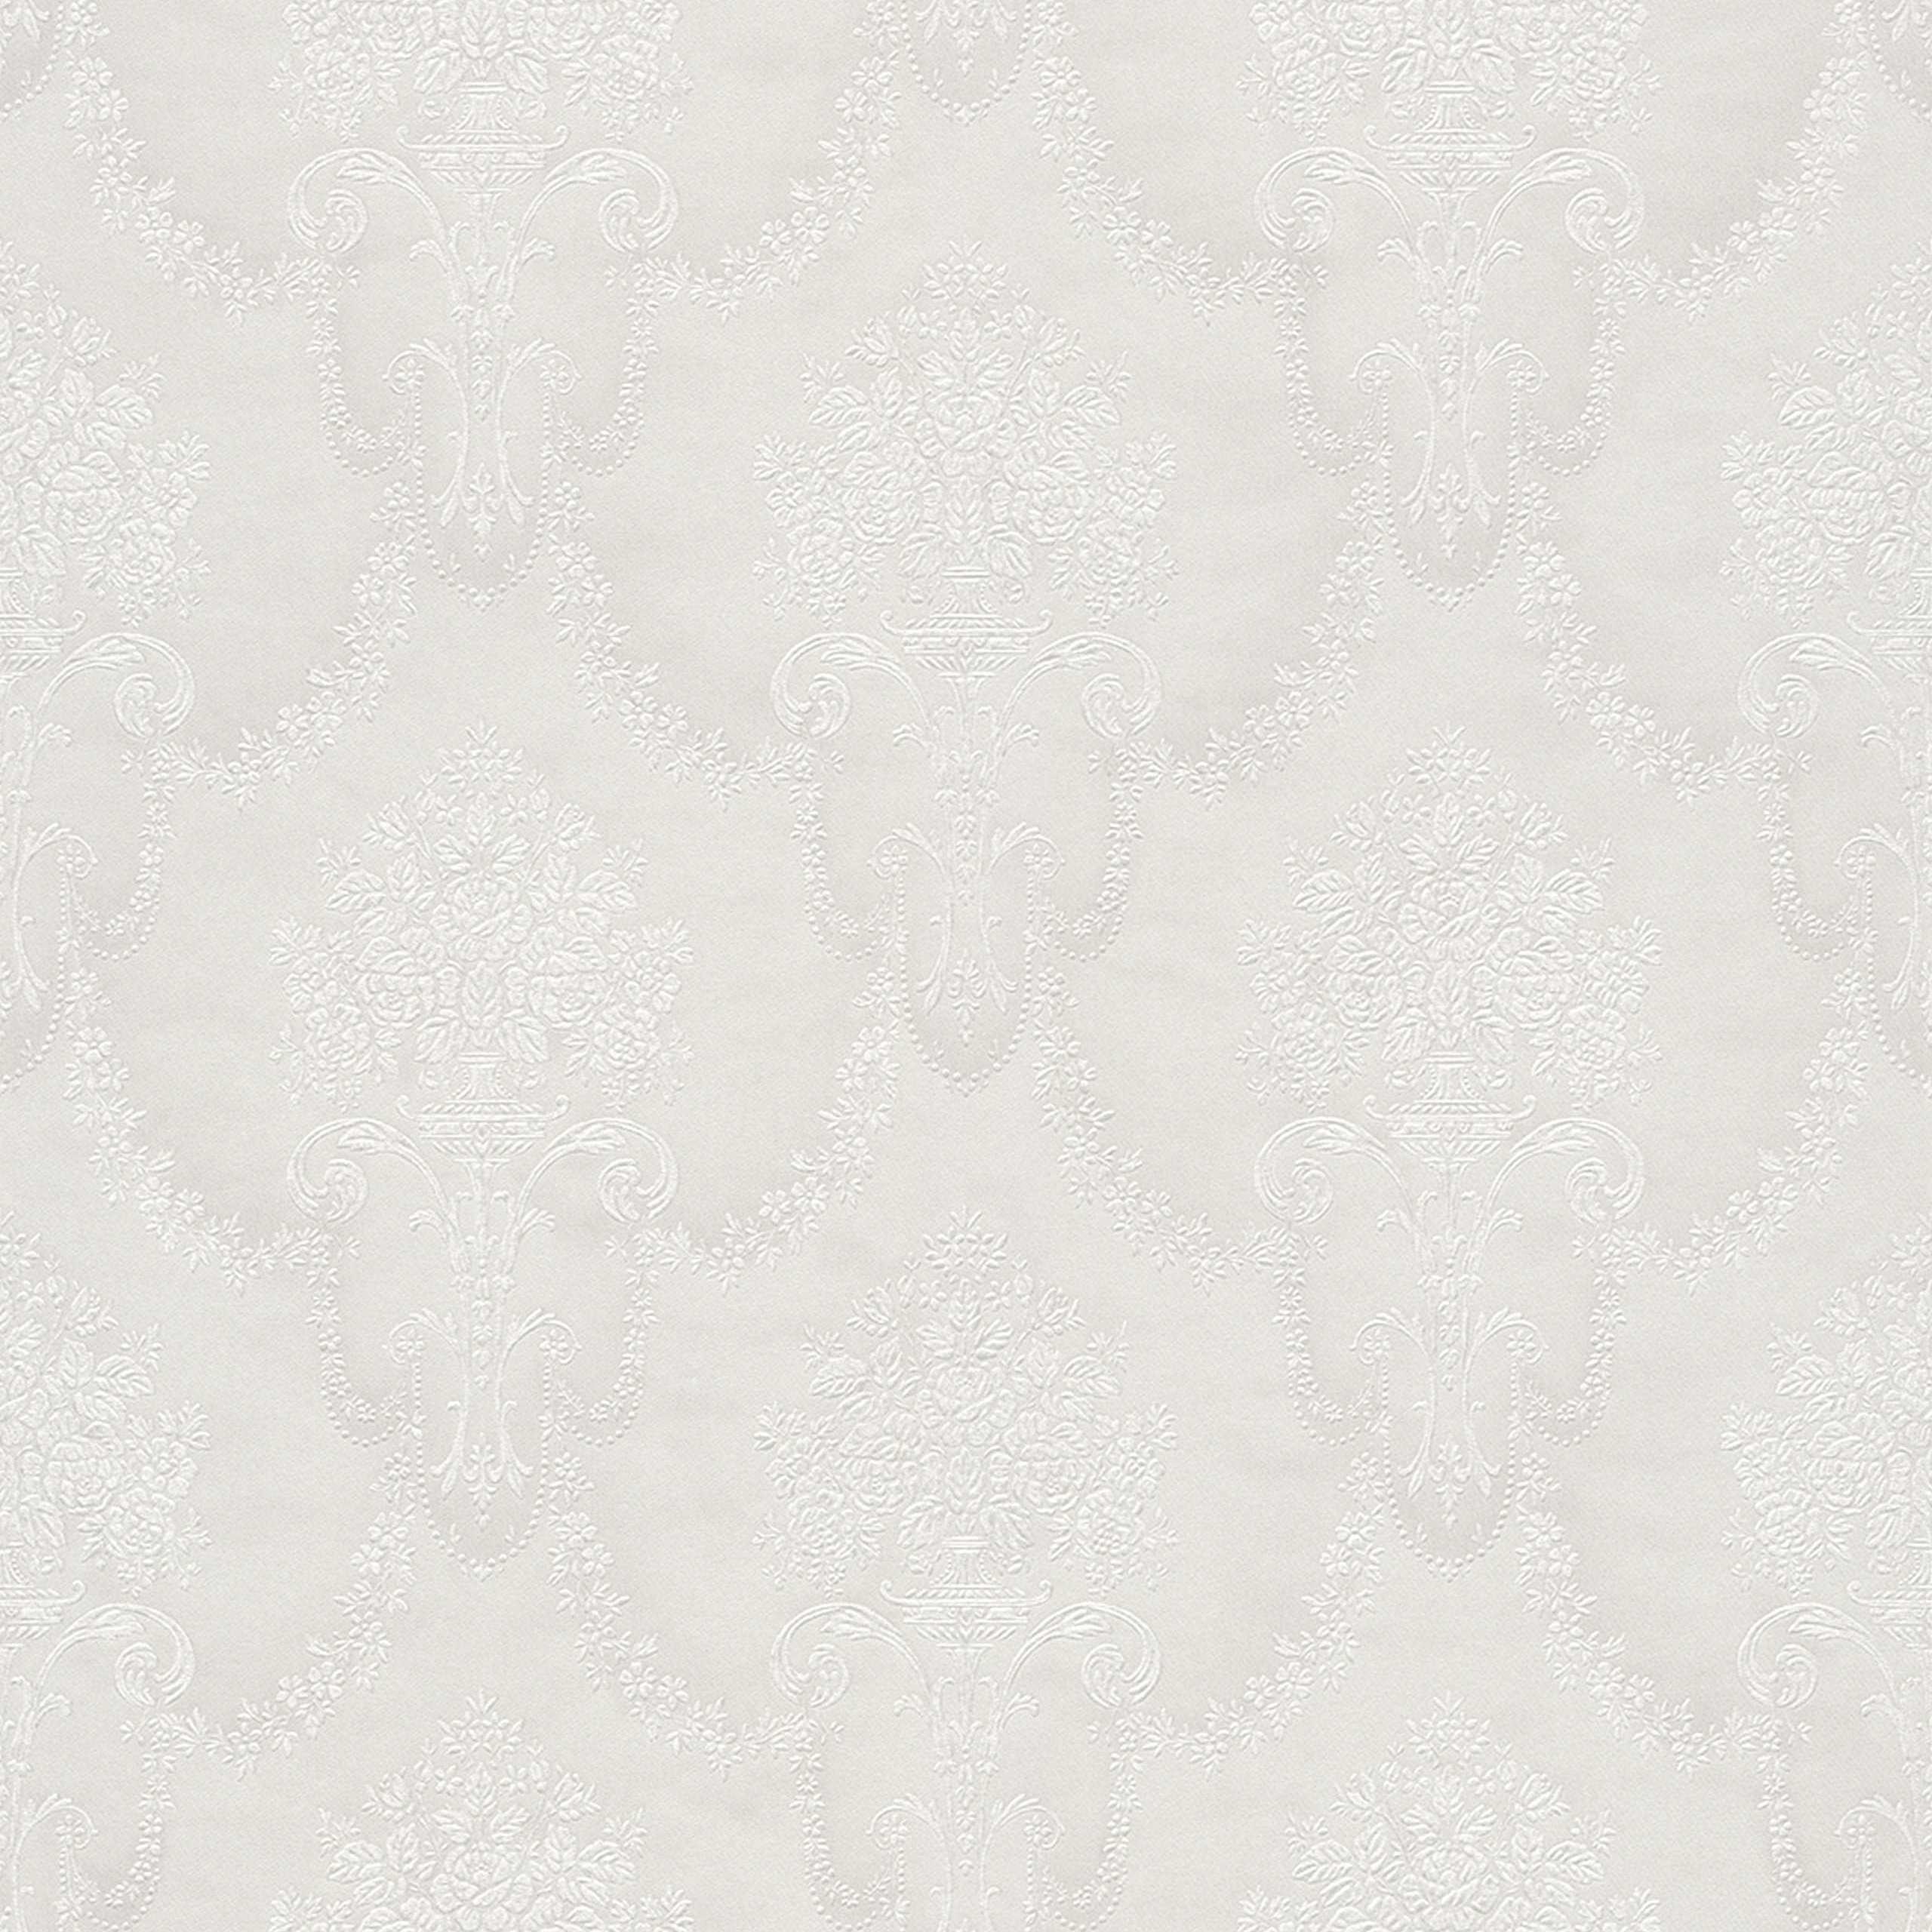 Rasch Vlies-Tapete Kollektion 'Trianon XI' 514919 Vintage Barock-Dekor